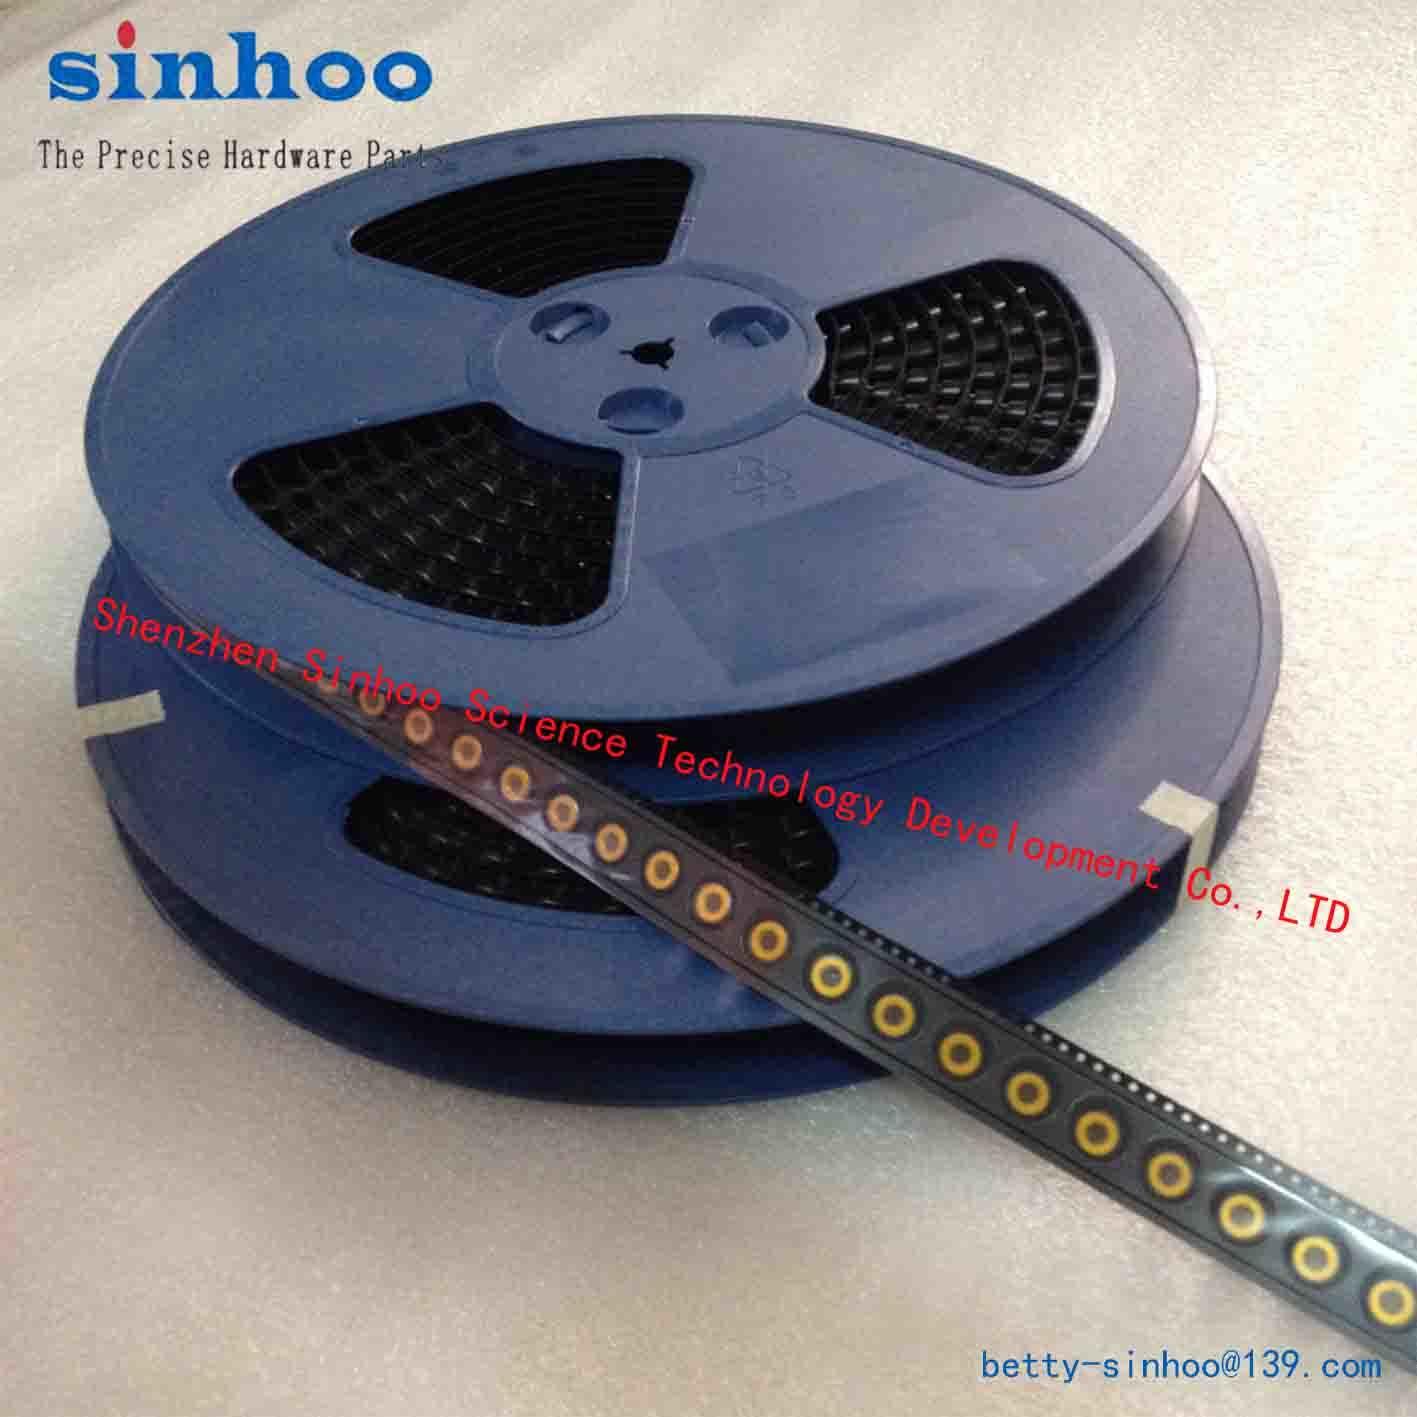 SMT Nut, Weld Nut, Smtso-M2.5-3.5et, Reel Package, Solder Nut, Standoff, Brass Reel